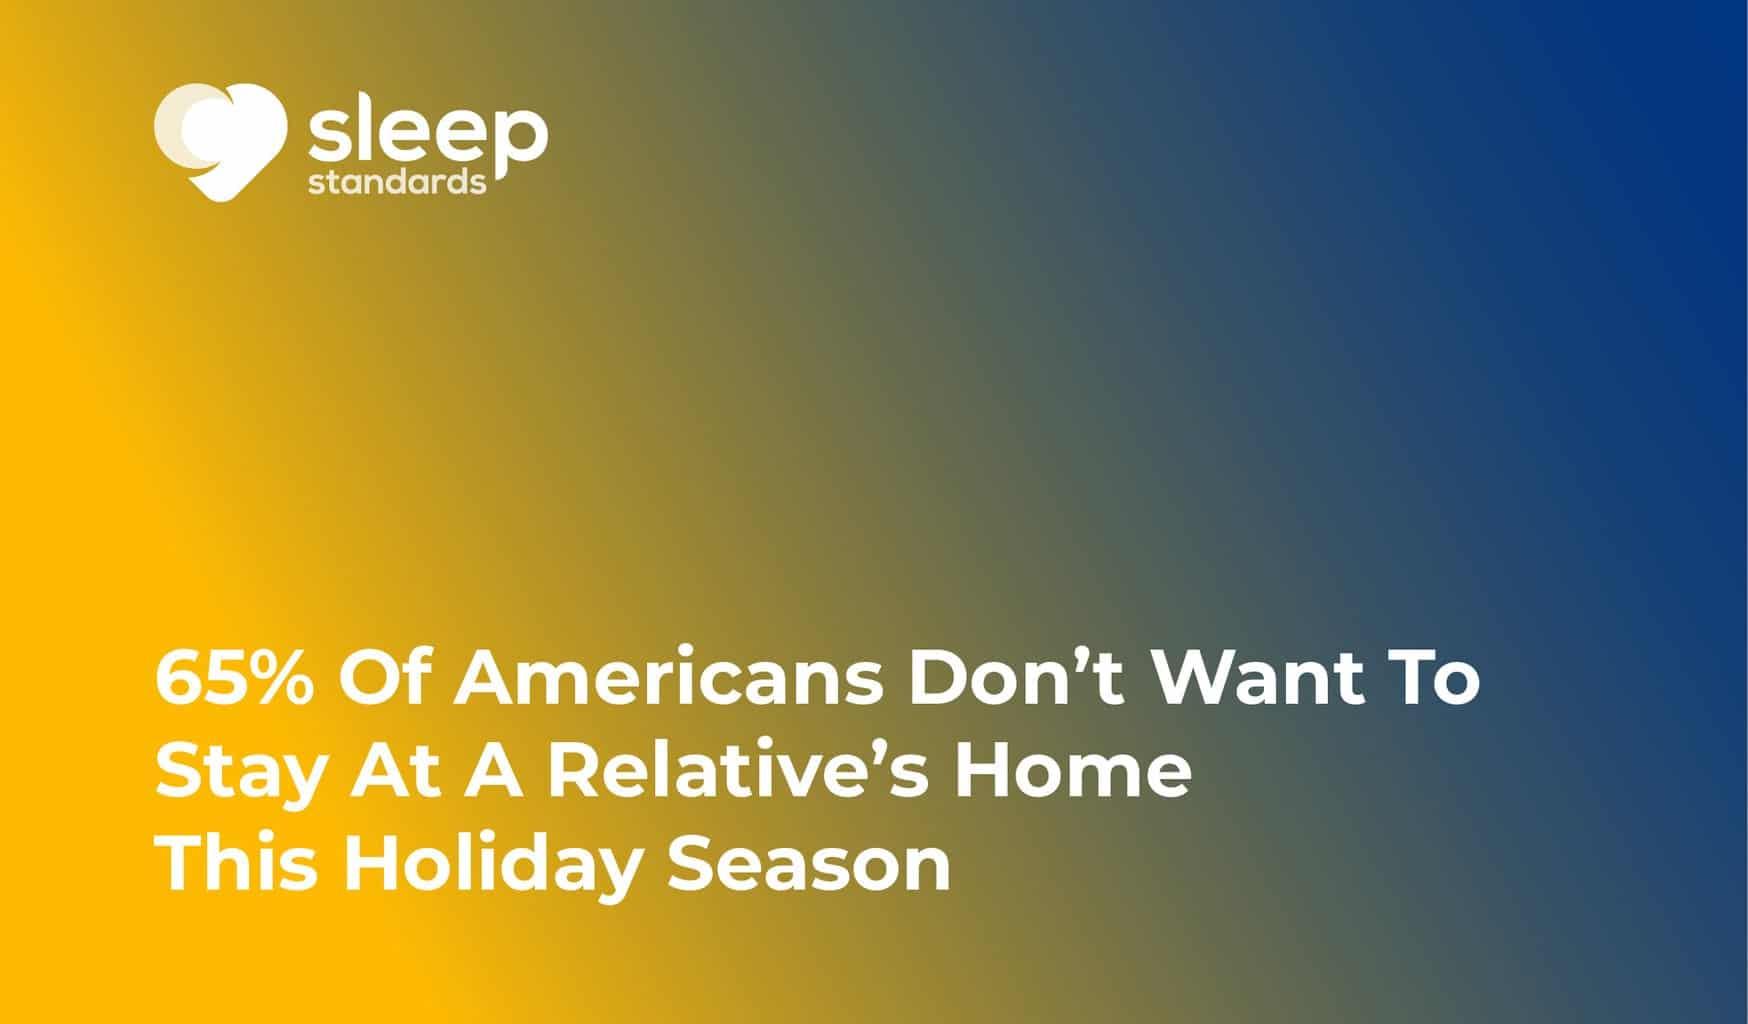 Holiday survey